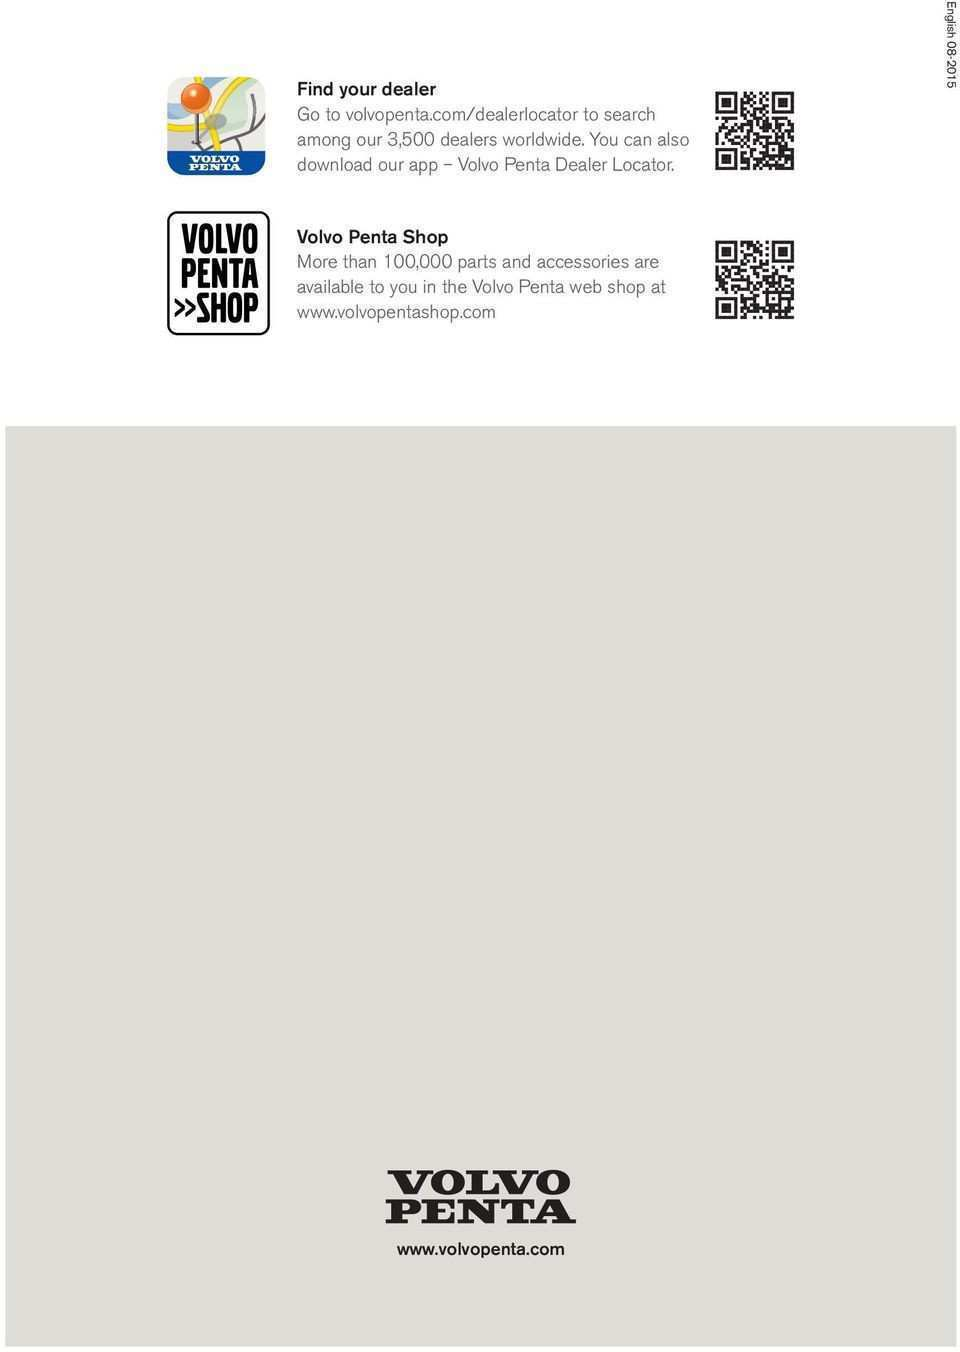 33 New Volvo Penta 2020D Service Manual Release Date for Volvo Penta